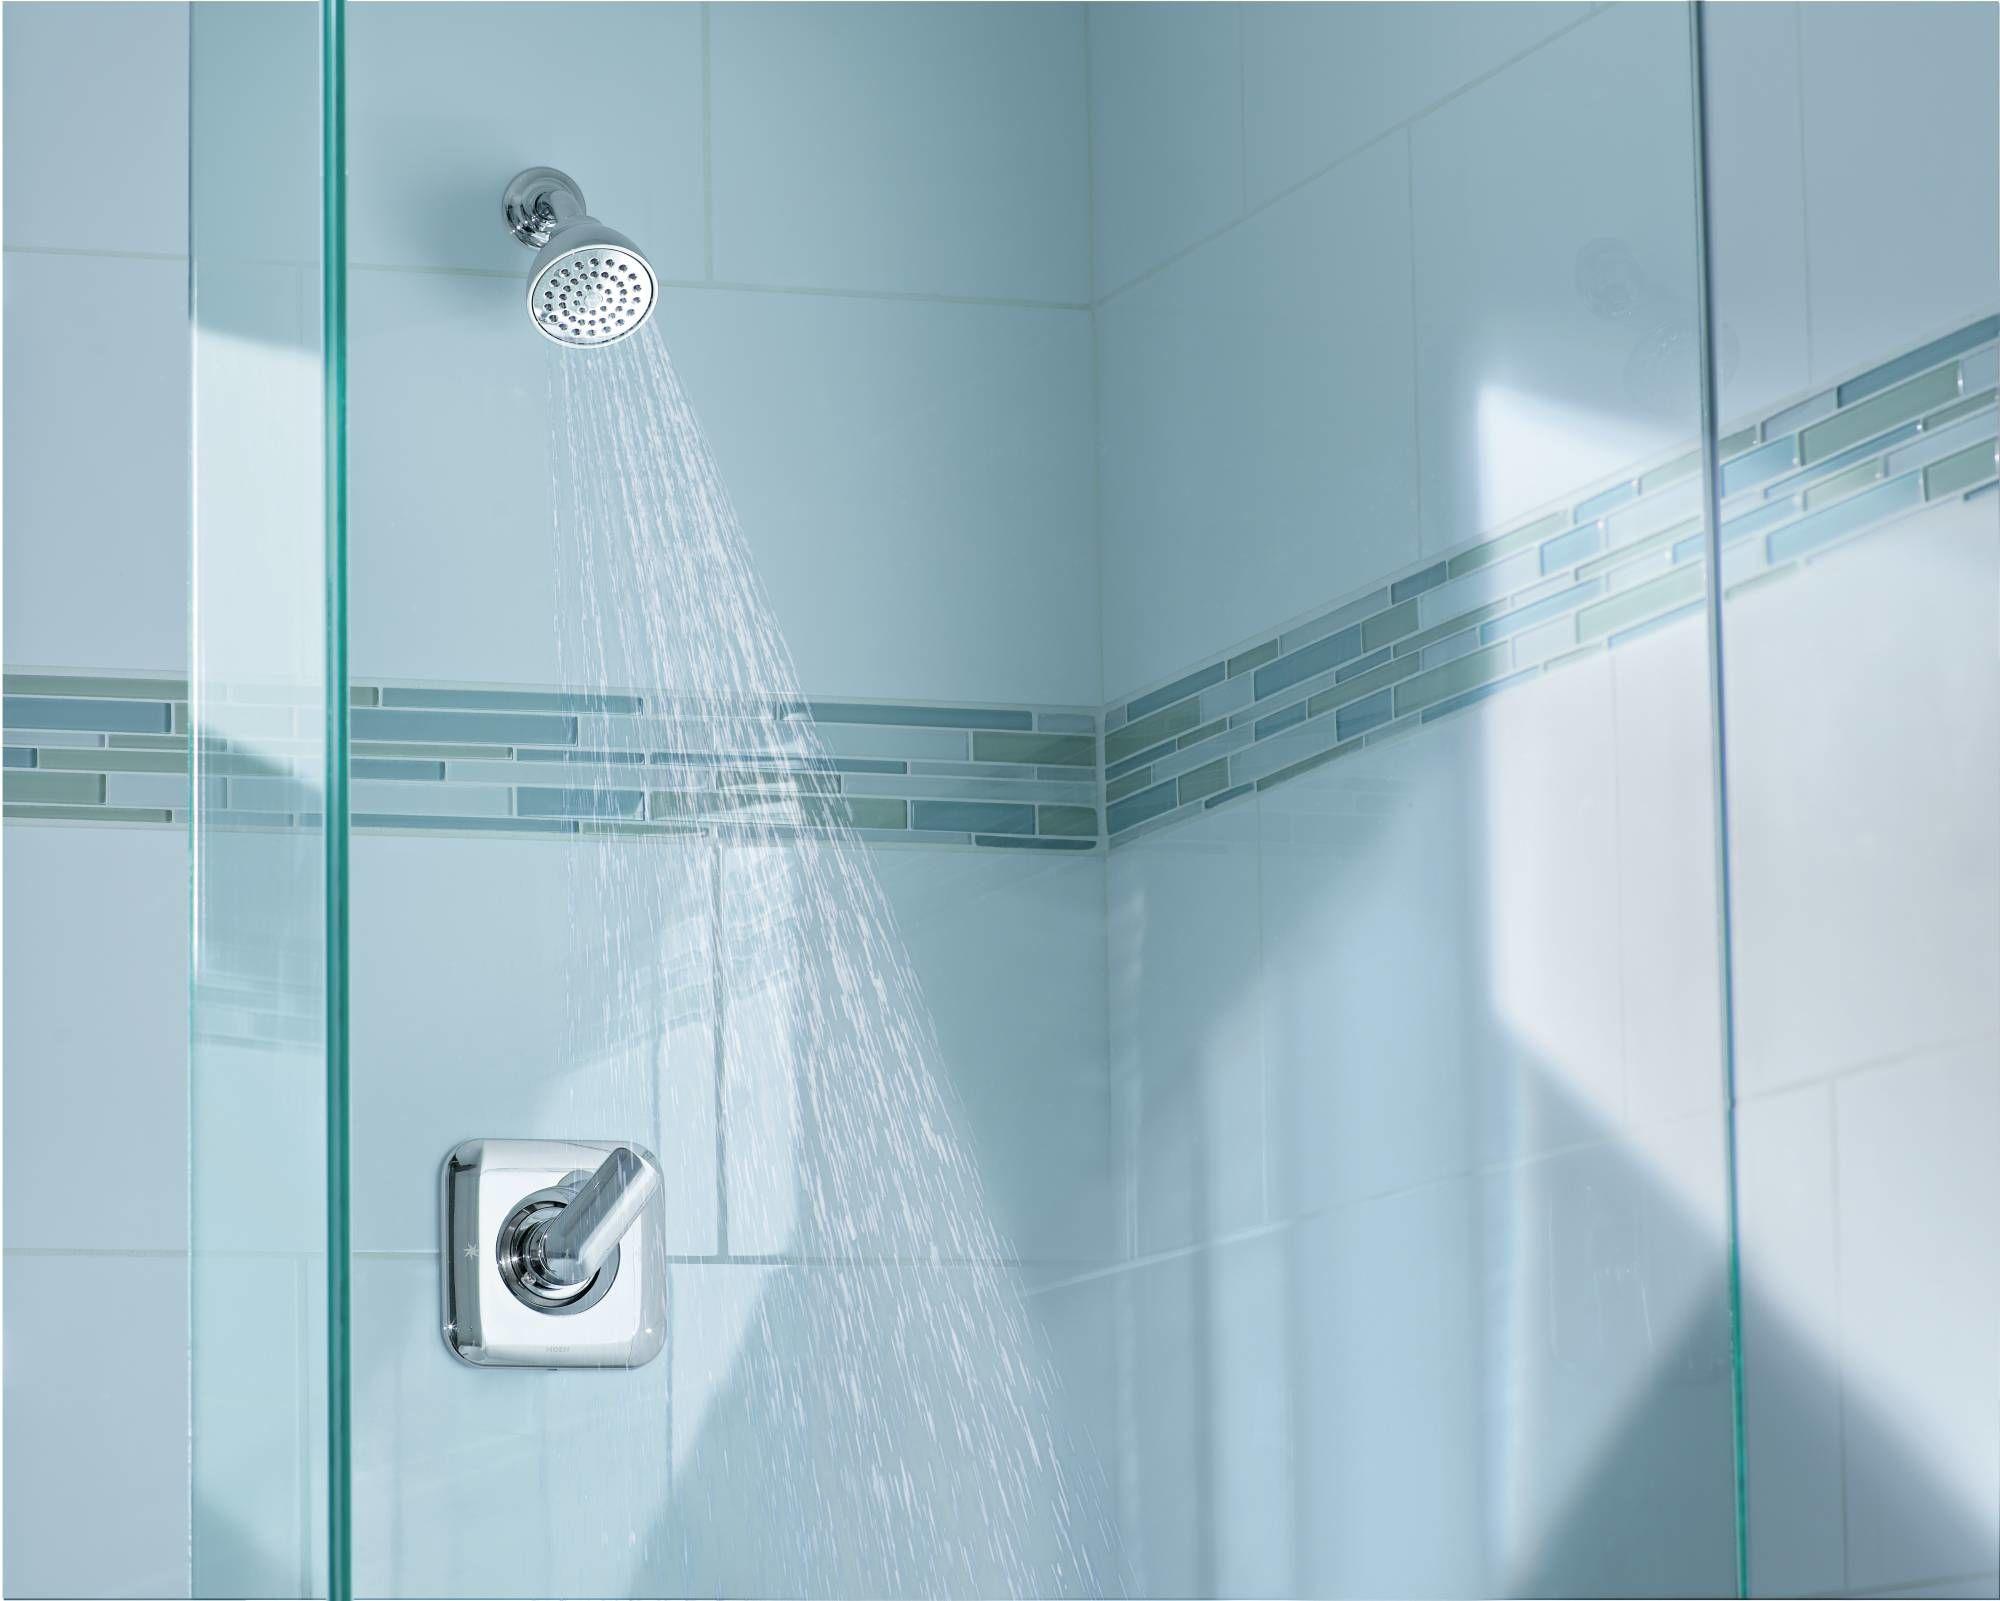 Moen T2812 Chrome Rizon Posi-Temp® Shower Trim Only - Faucet.com